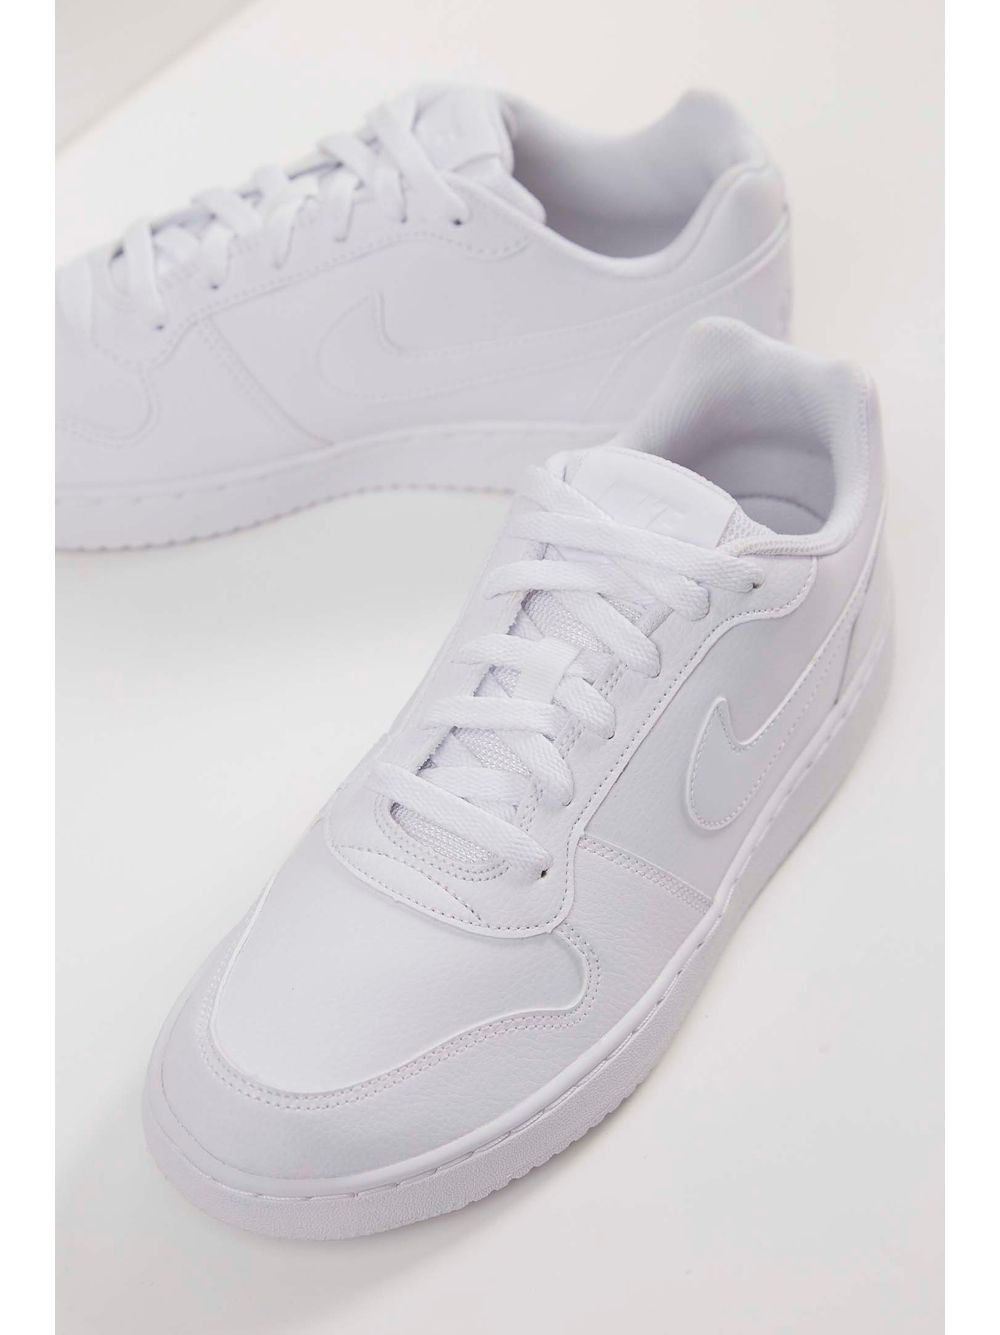 Casual Low Tênis Nike Ebernon Branco Pittol TF3lKc5u1J